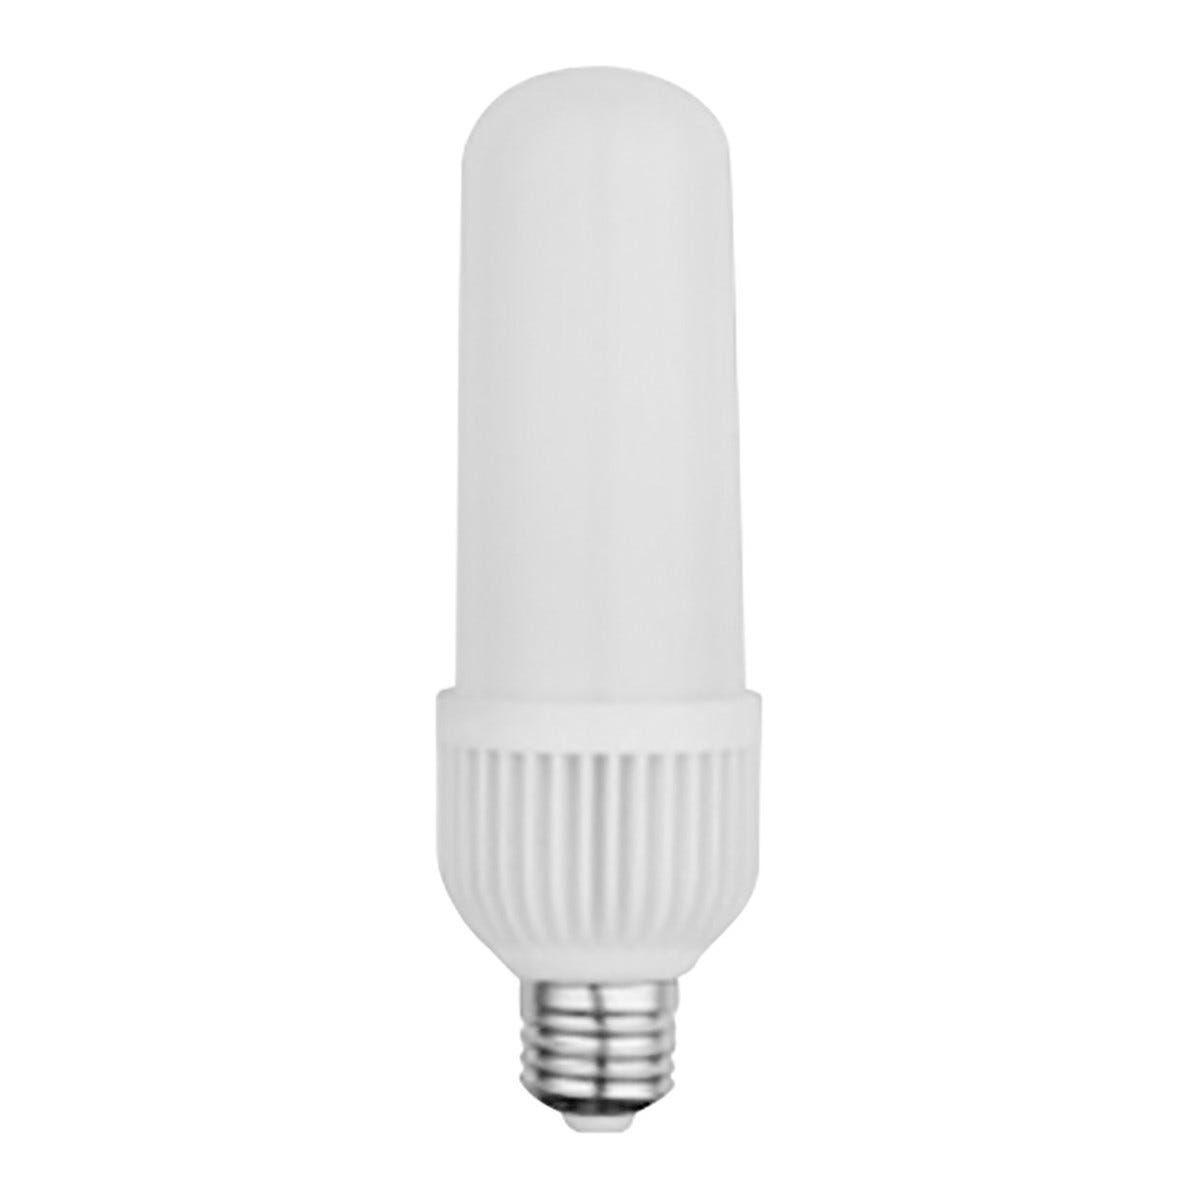 vivida international lampadina vivida led u-shape e27 11w=67w 930 lumen 3000k luce calda dimensioni Ø43x160 mm